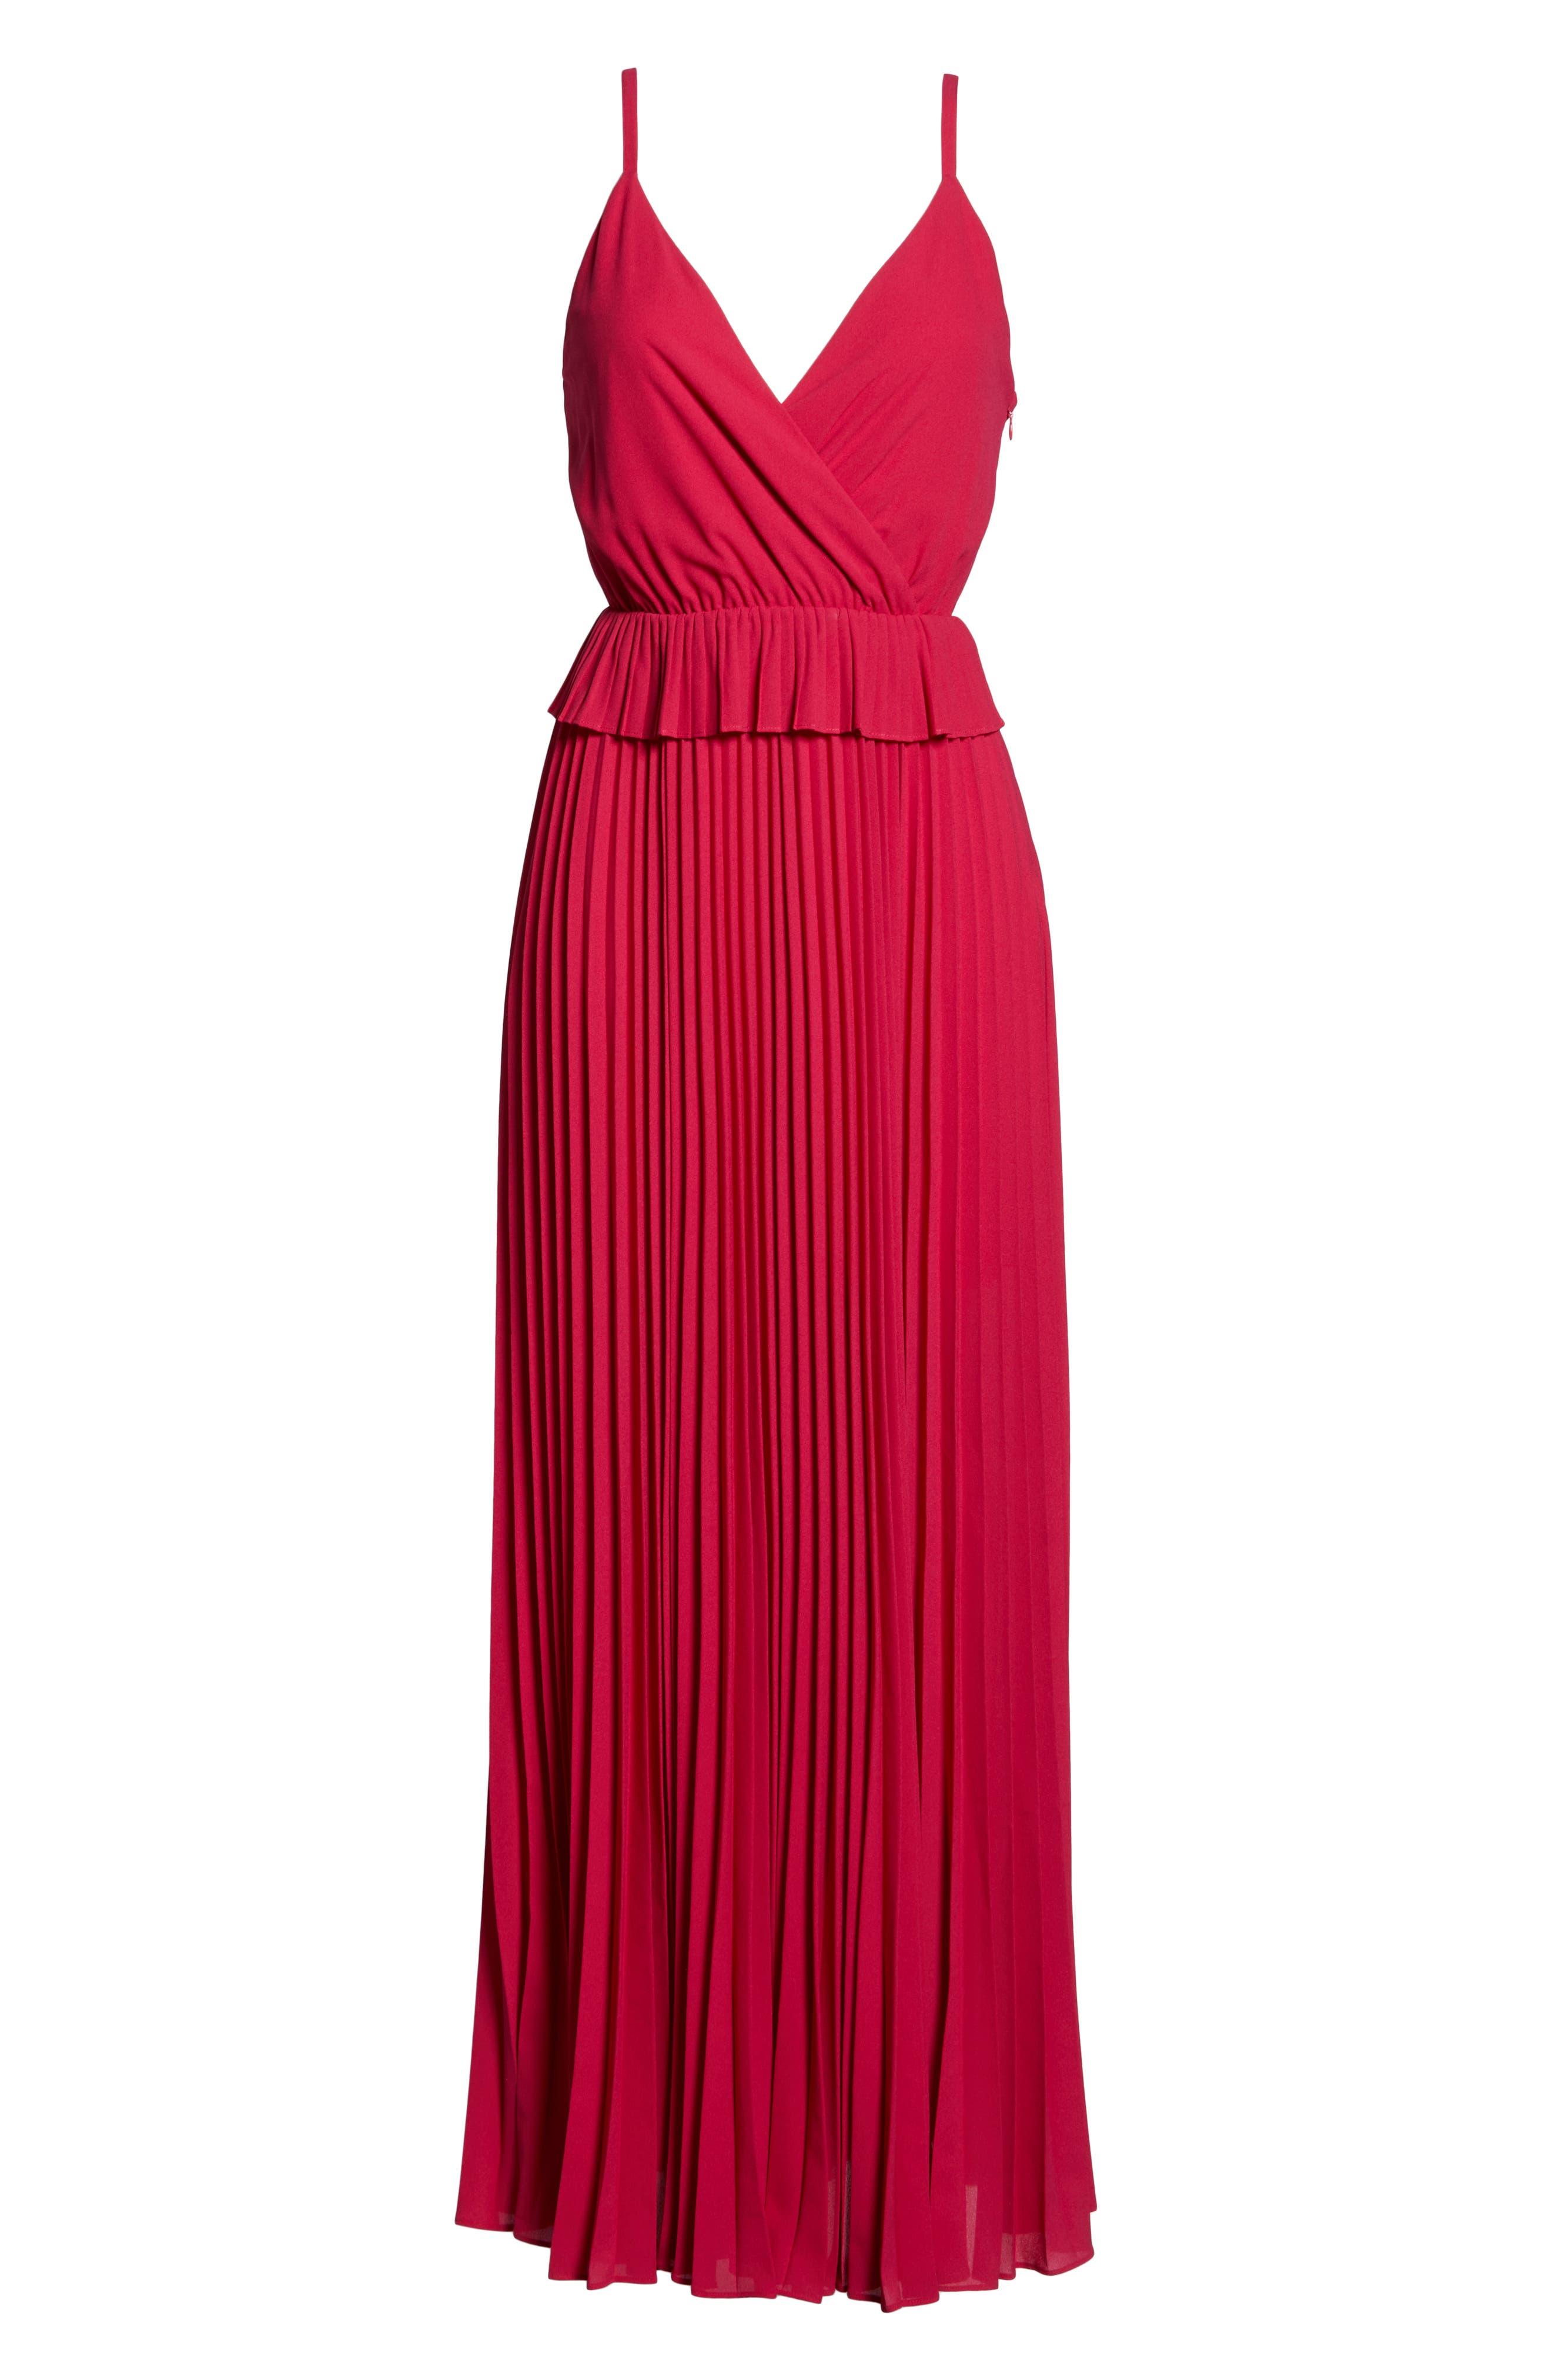 ALI & JAY, Olivet Pleated Maxi Dress, Alternate thumbnail 7, color, RASPBERRY